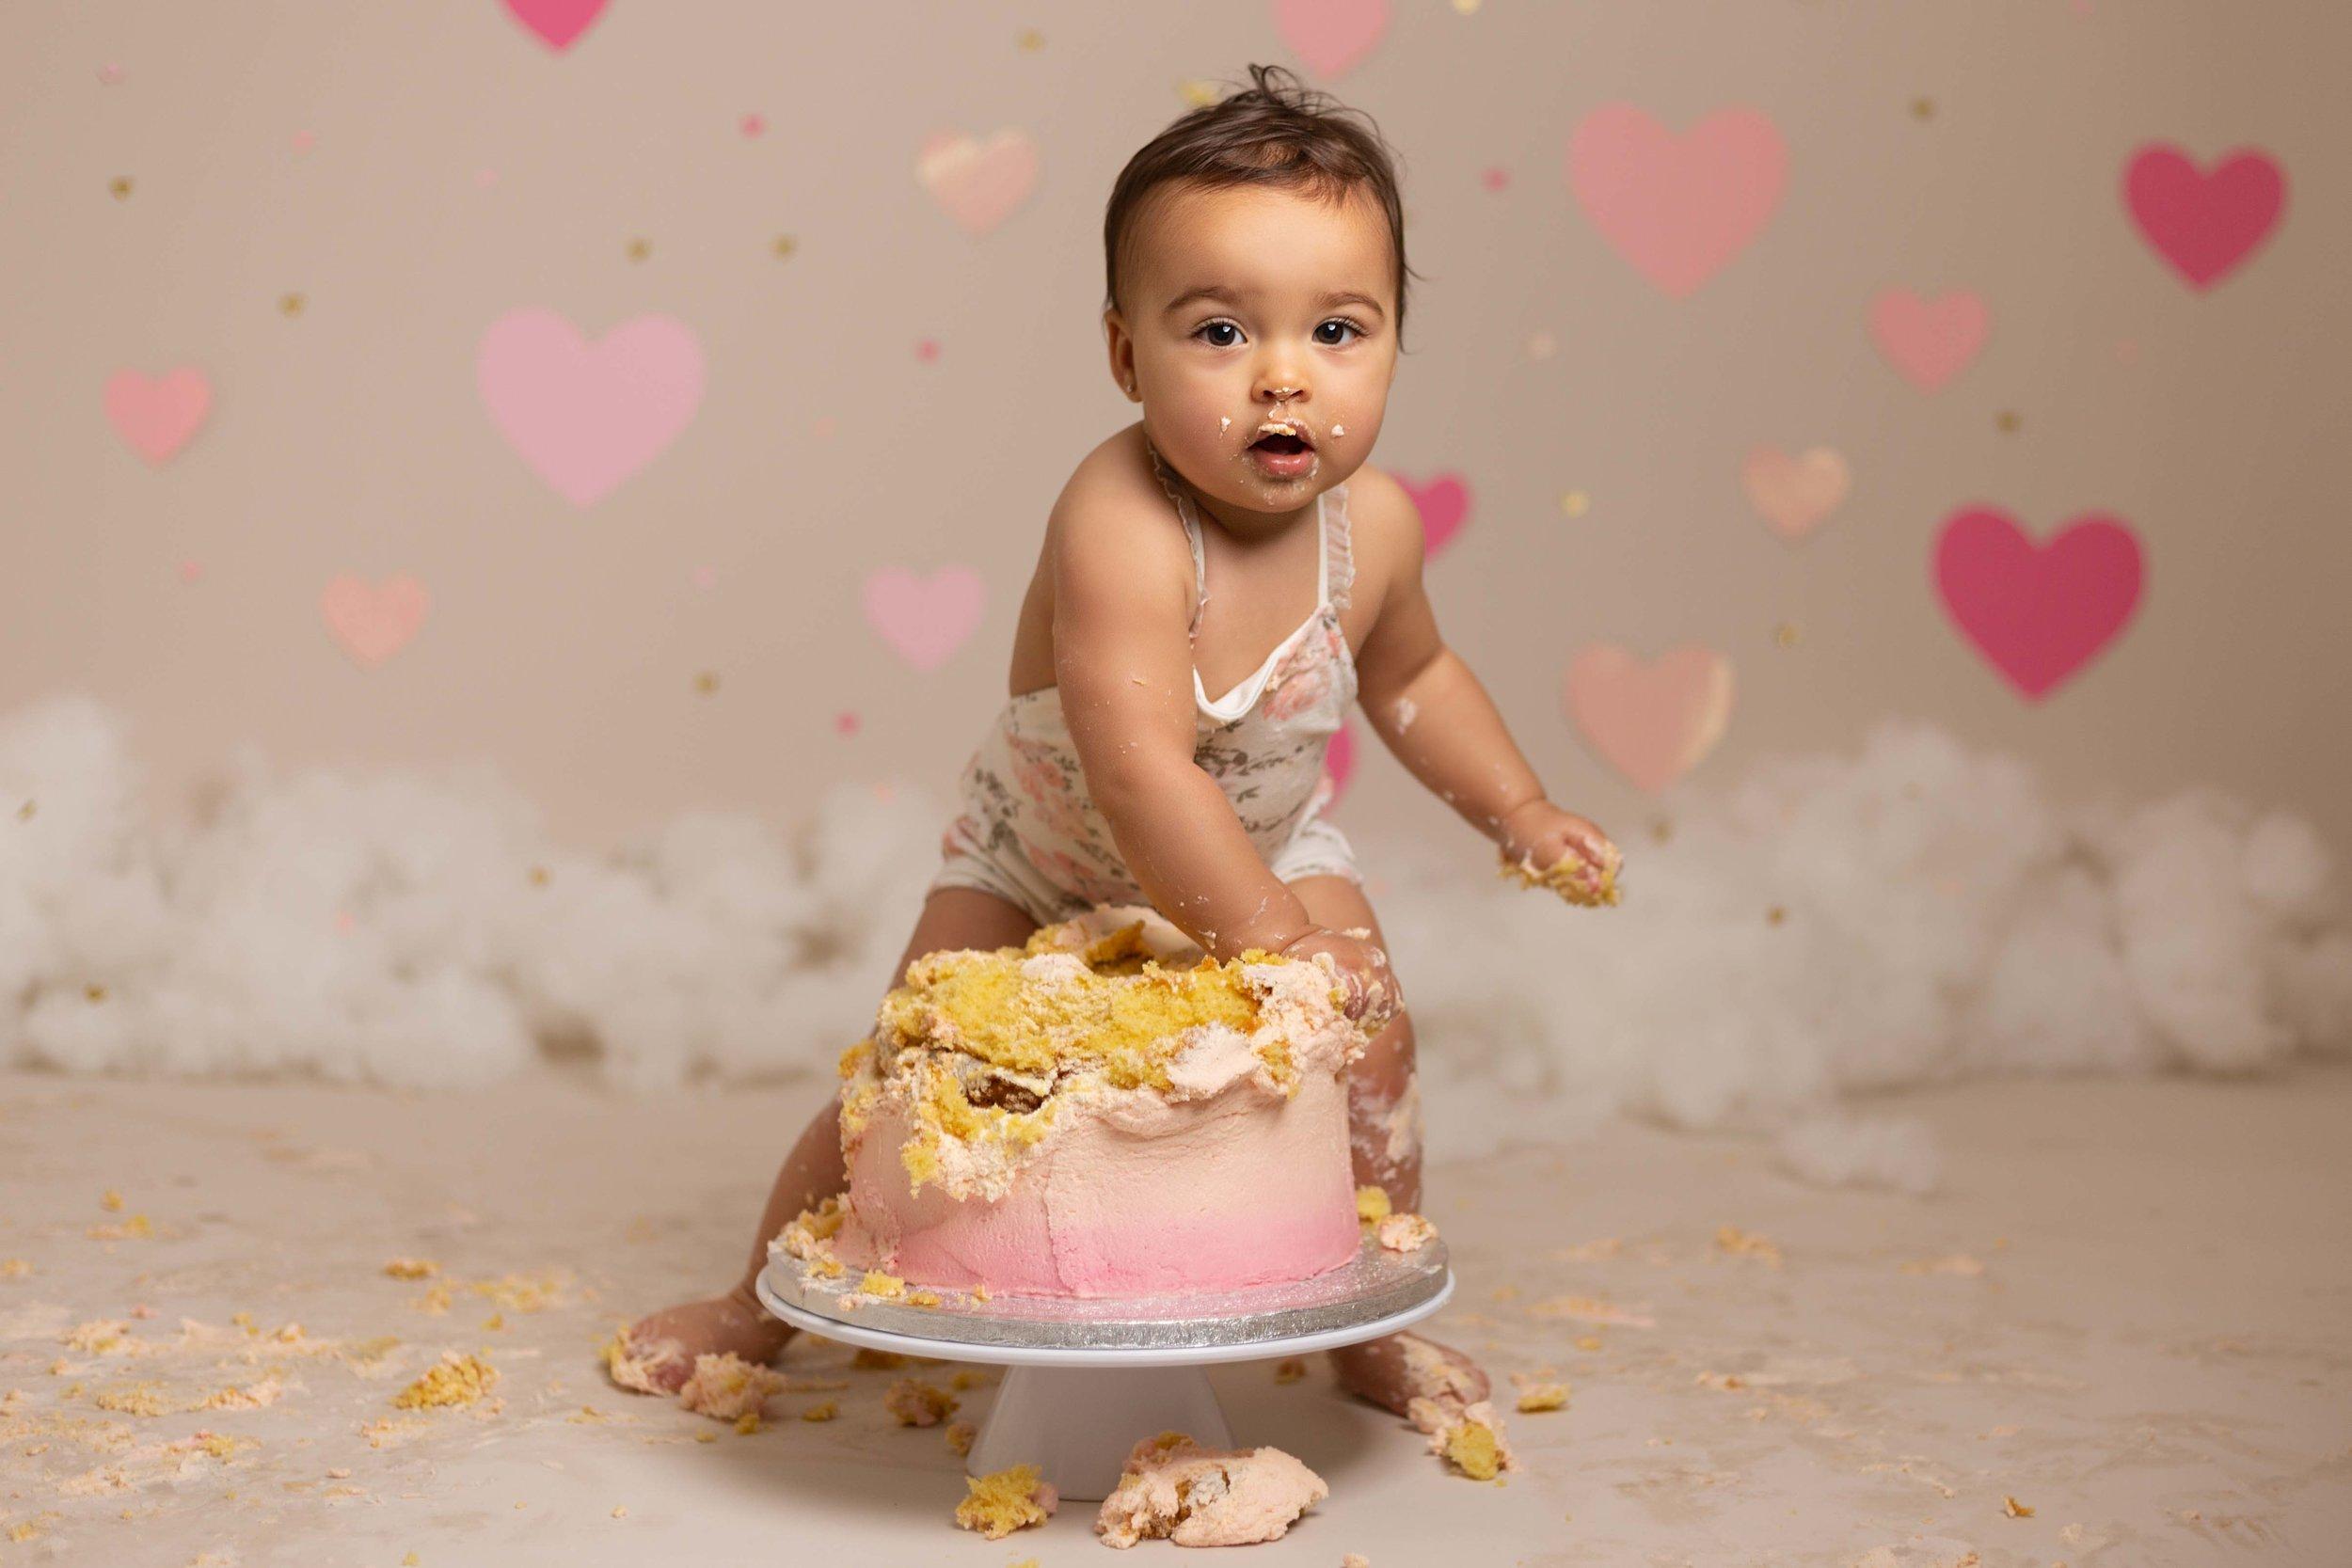 Lea-cooper-photography-cake-smash-photographer-1st-birthday-photos-willenhall-wolverhampton-west-midlands-birmingham-valentines-day-16.jpg